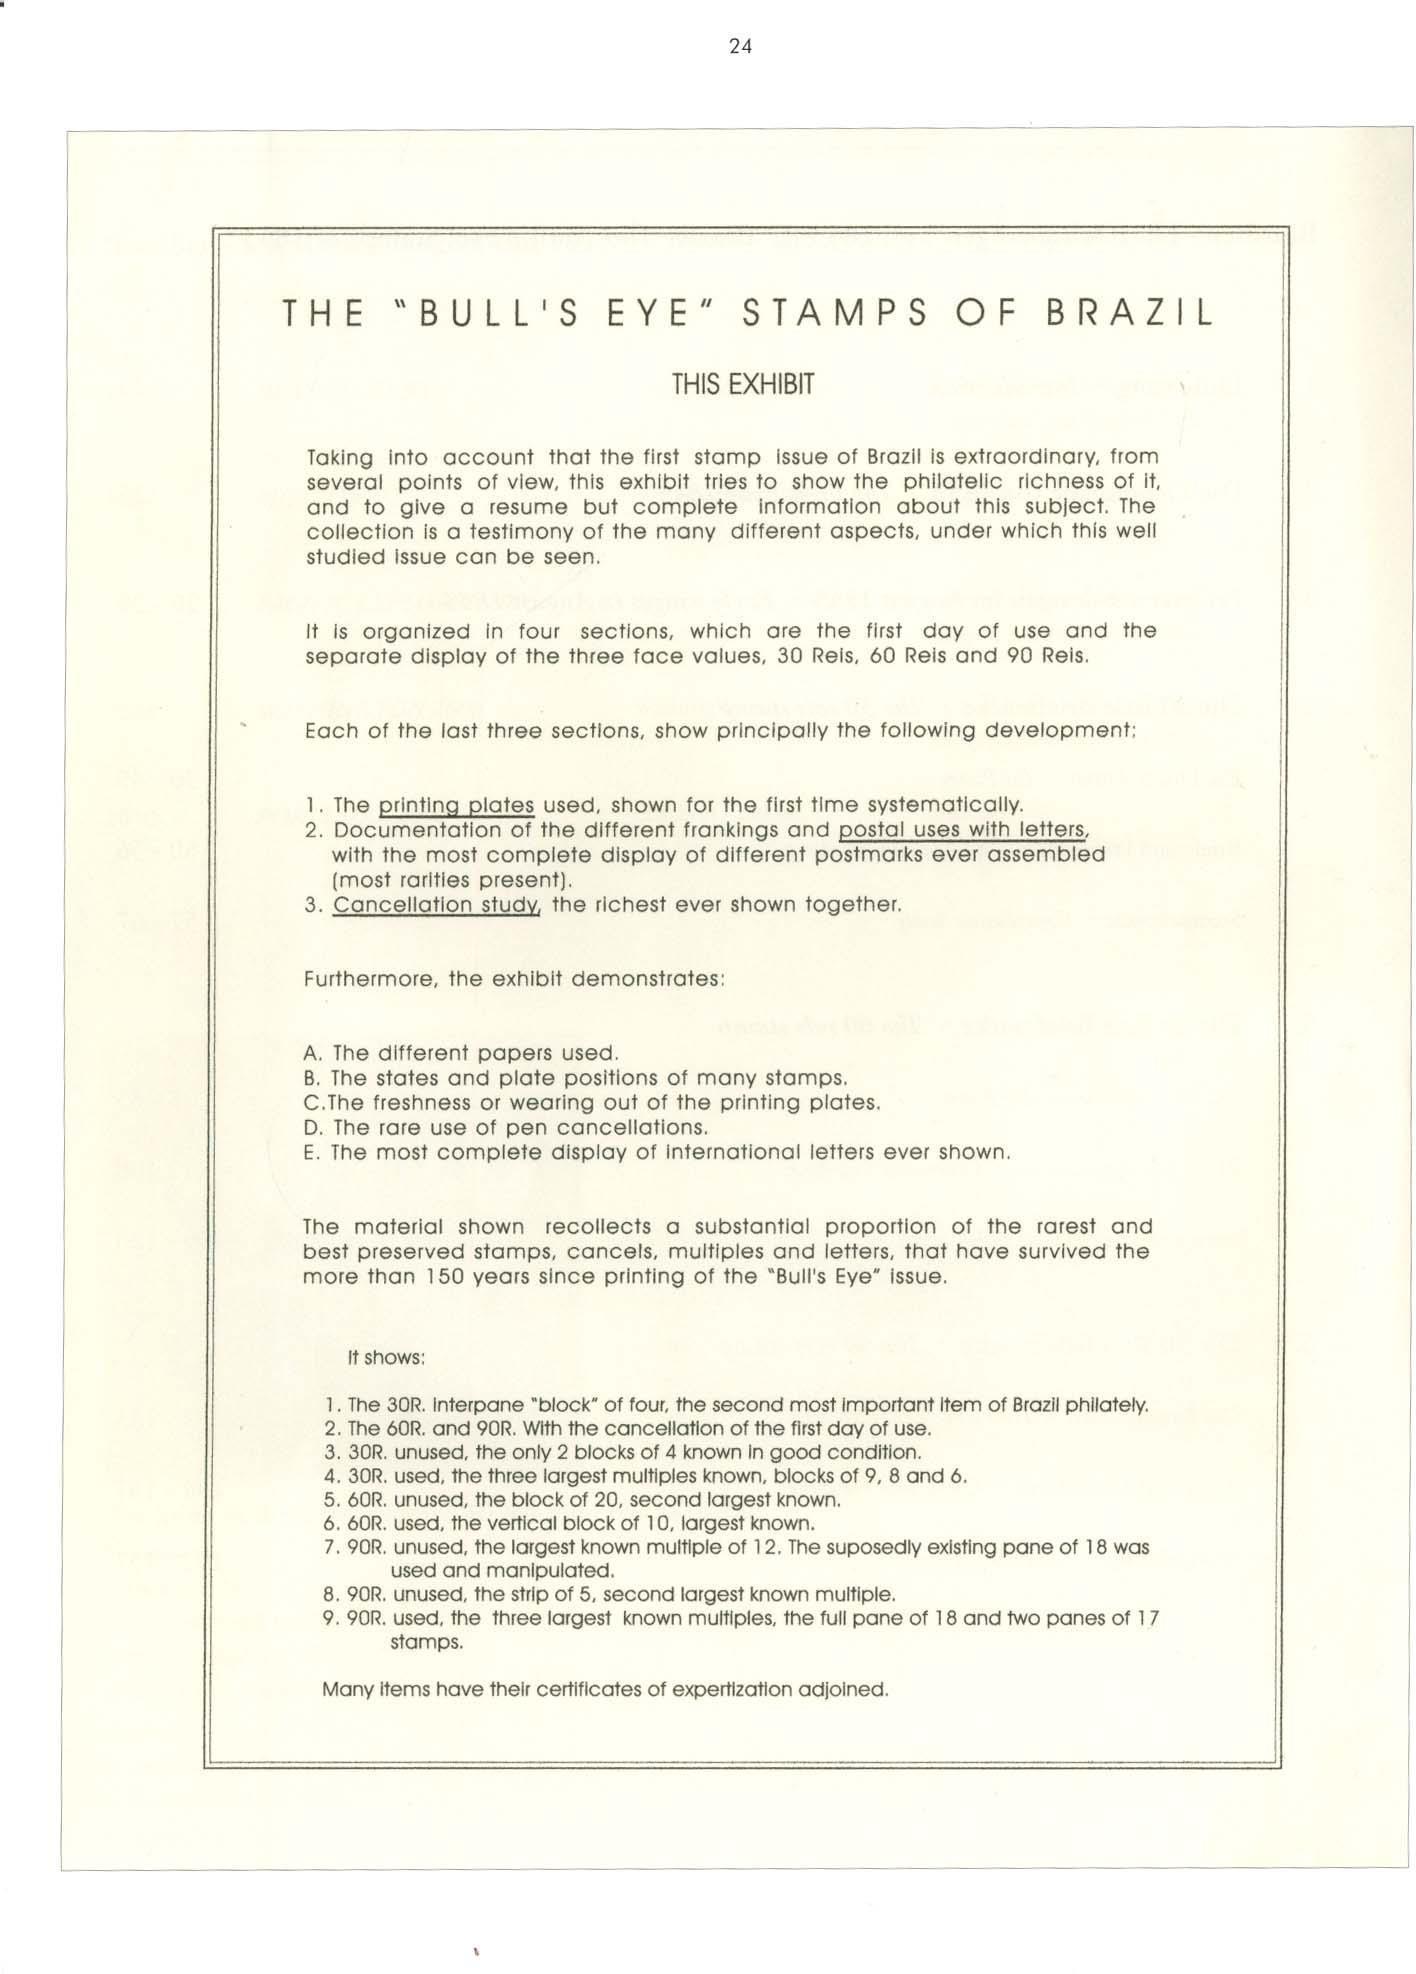 Vol. 32: Brazil - The